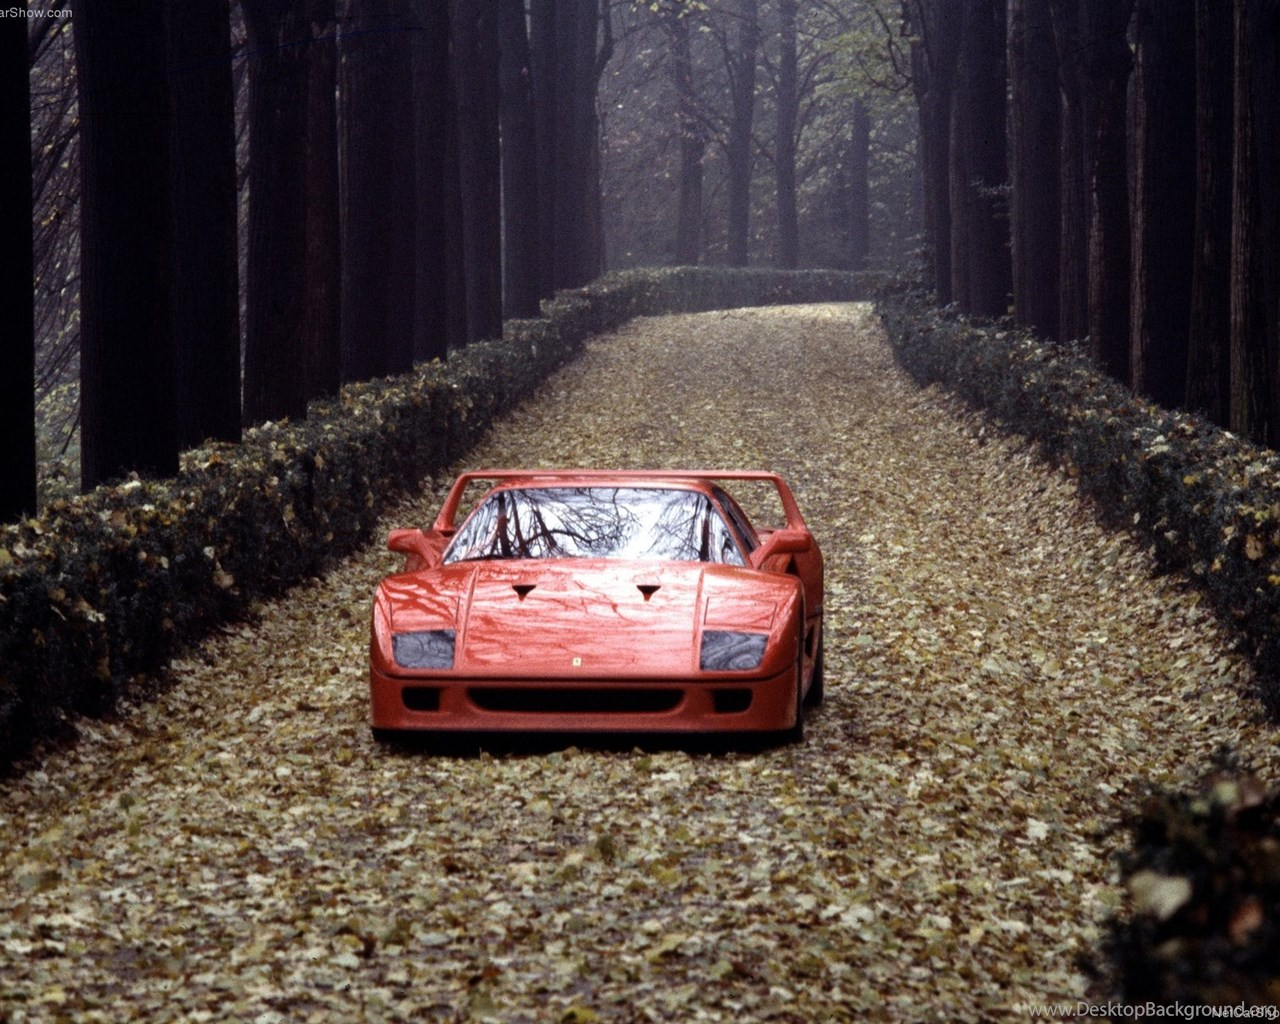 Ferrari F40 Wallpapers Iphone Image Desktop Background